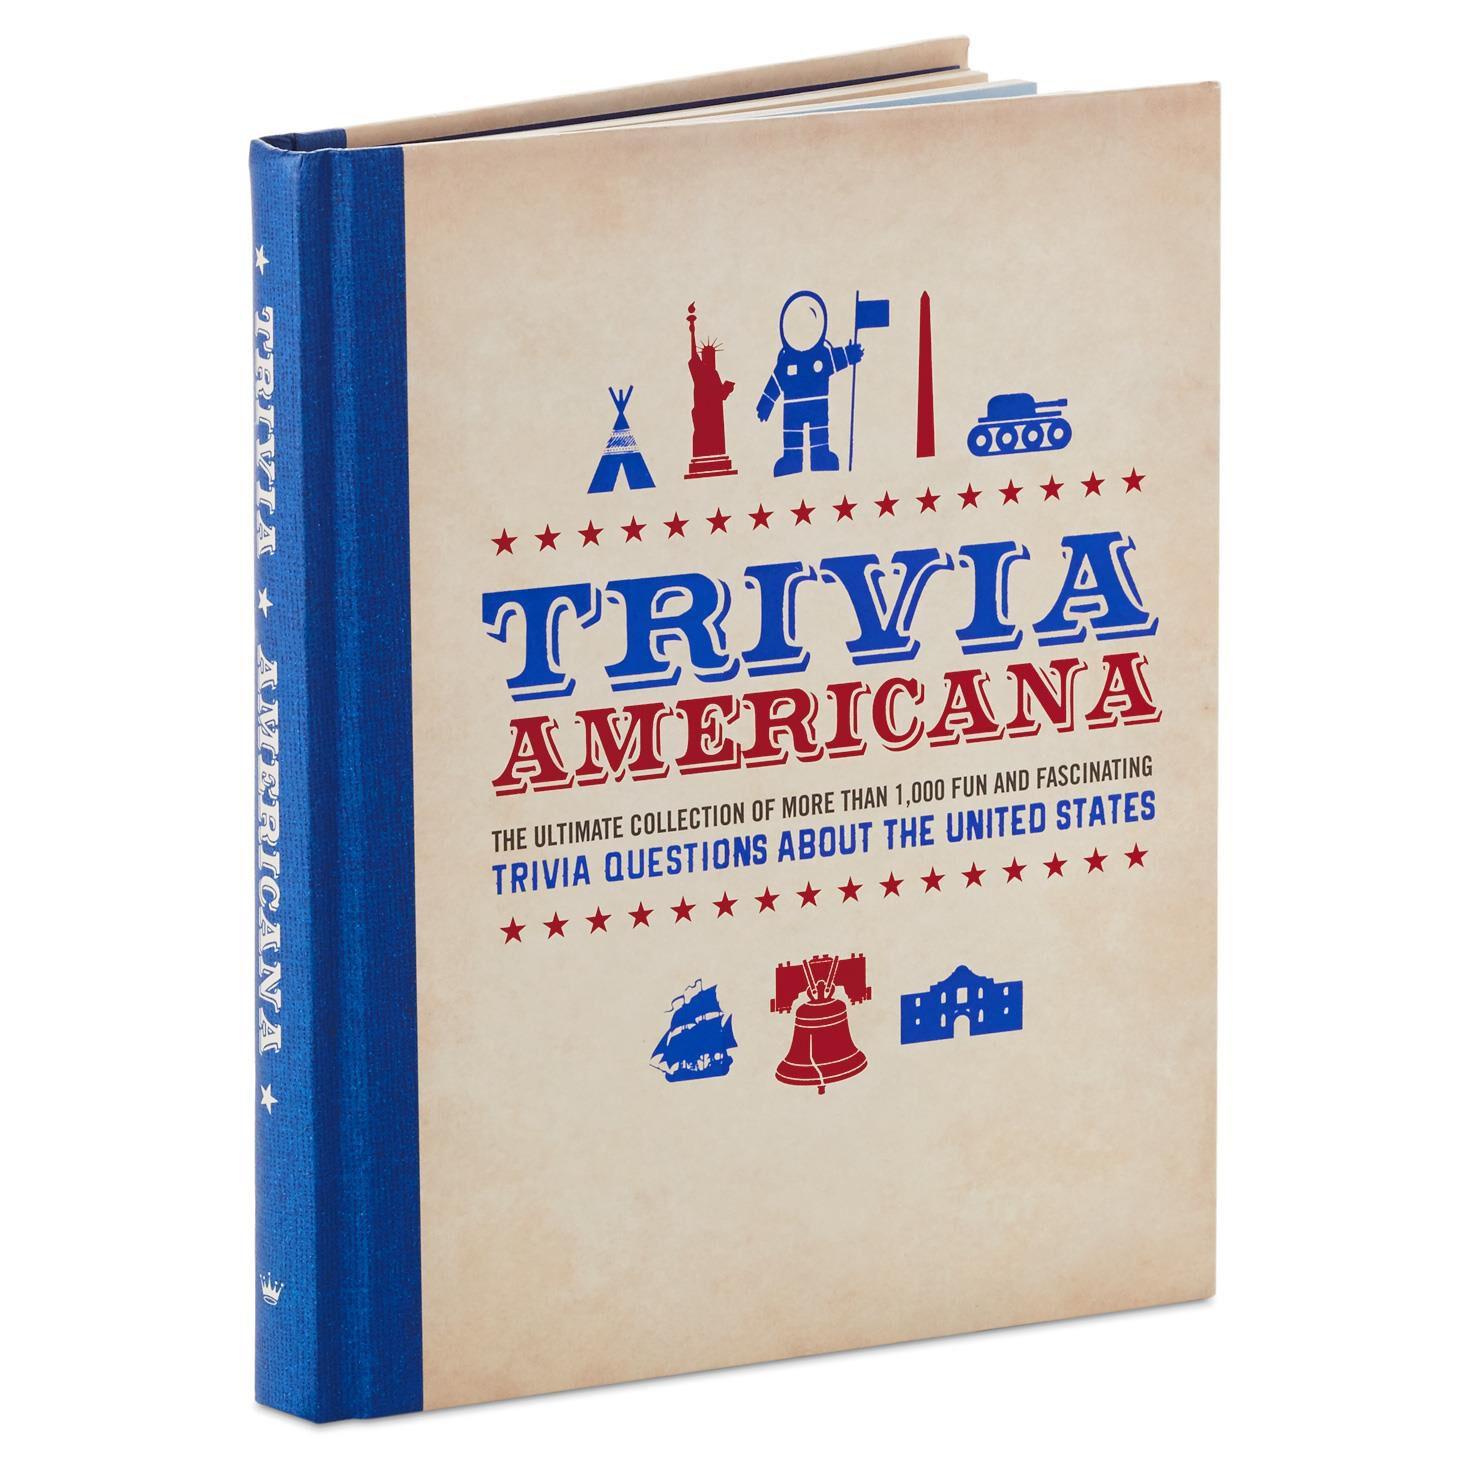 trivia americana book gift books hallmark